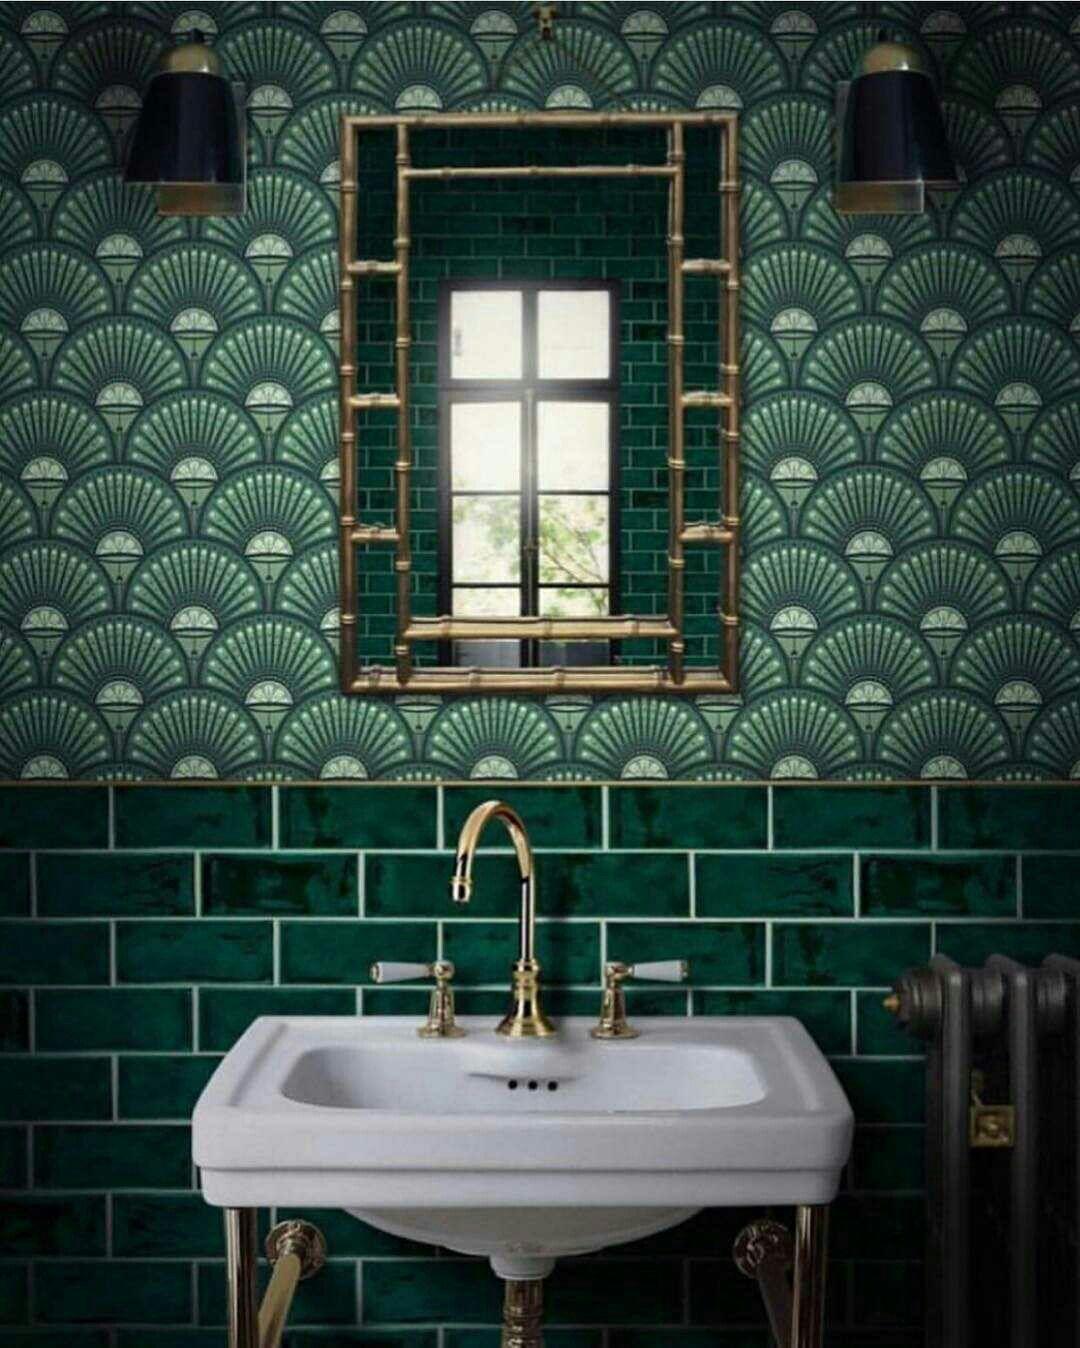 Glamorous Bathroom Inspiration Green Metro Tiles With Art Deco Style Green Wallpaper Unique Bathroom Tiles Glamorous Bathroom Bathroom Tile Designs